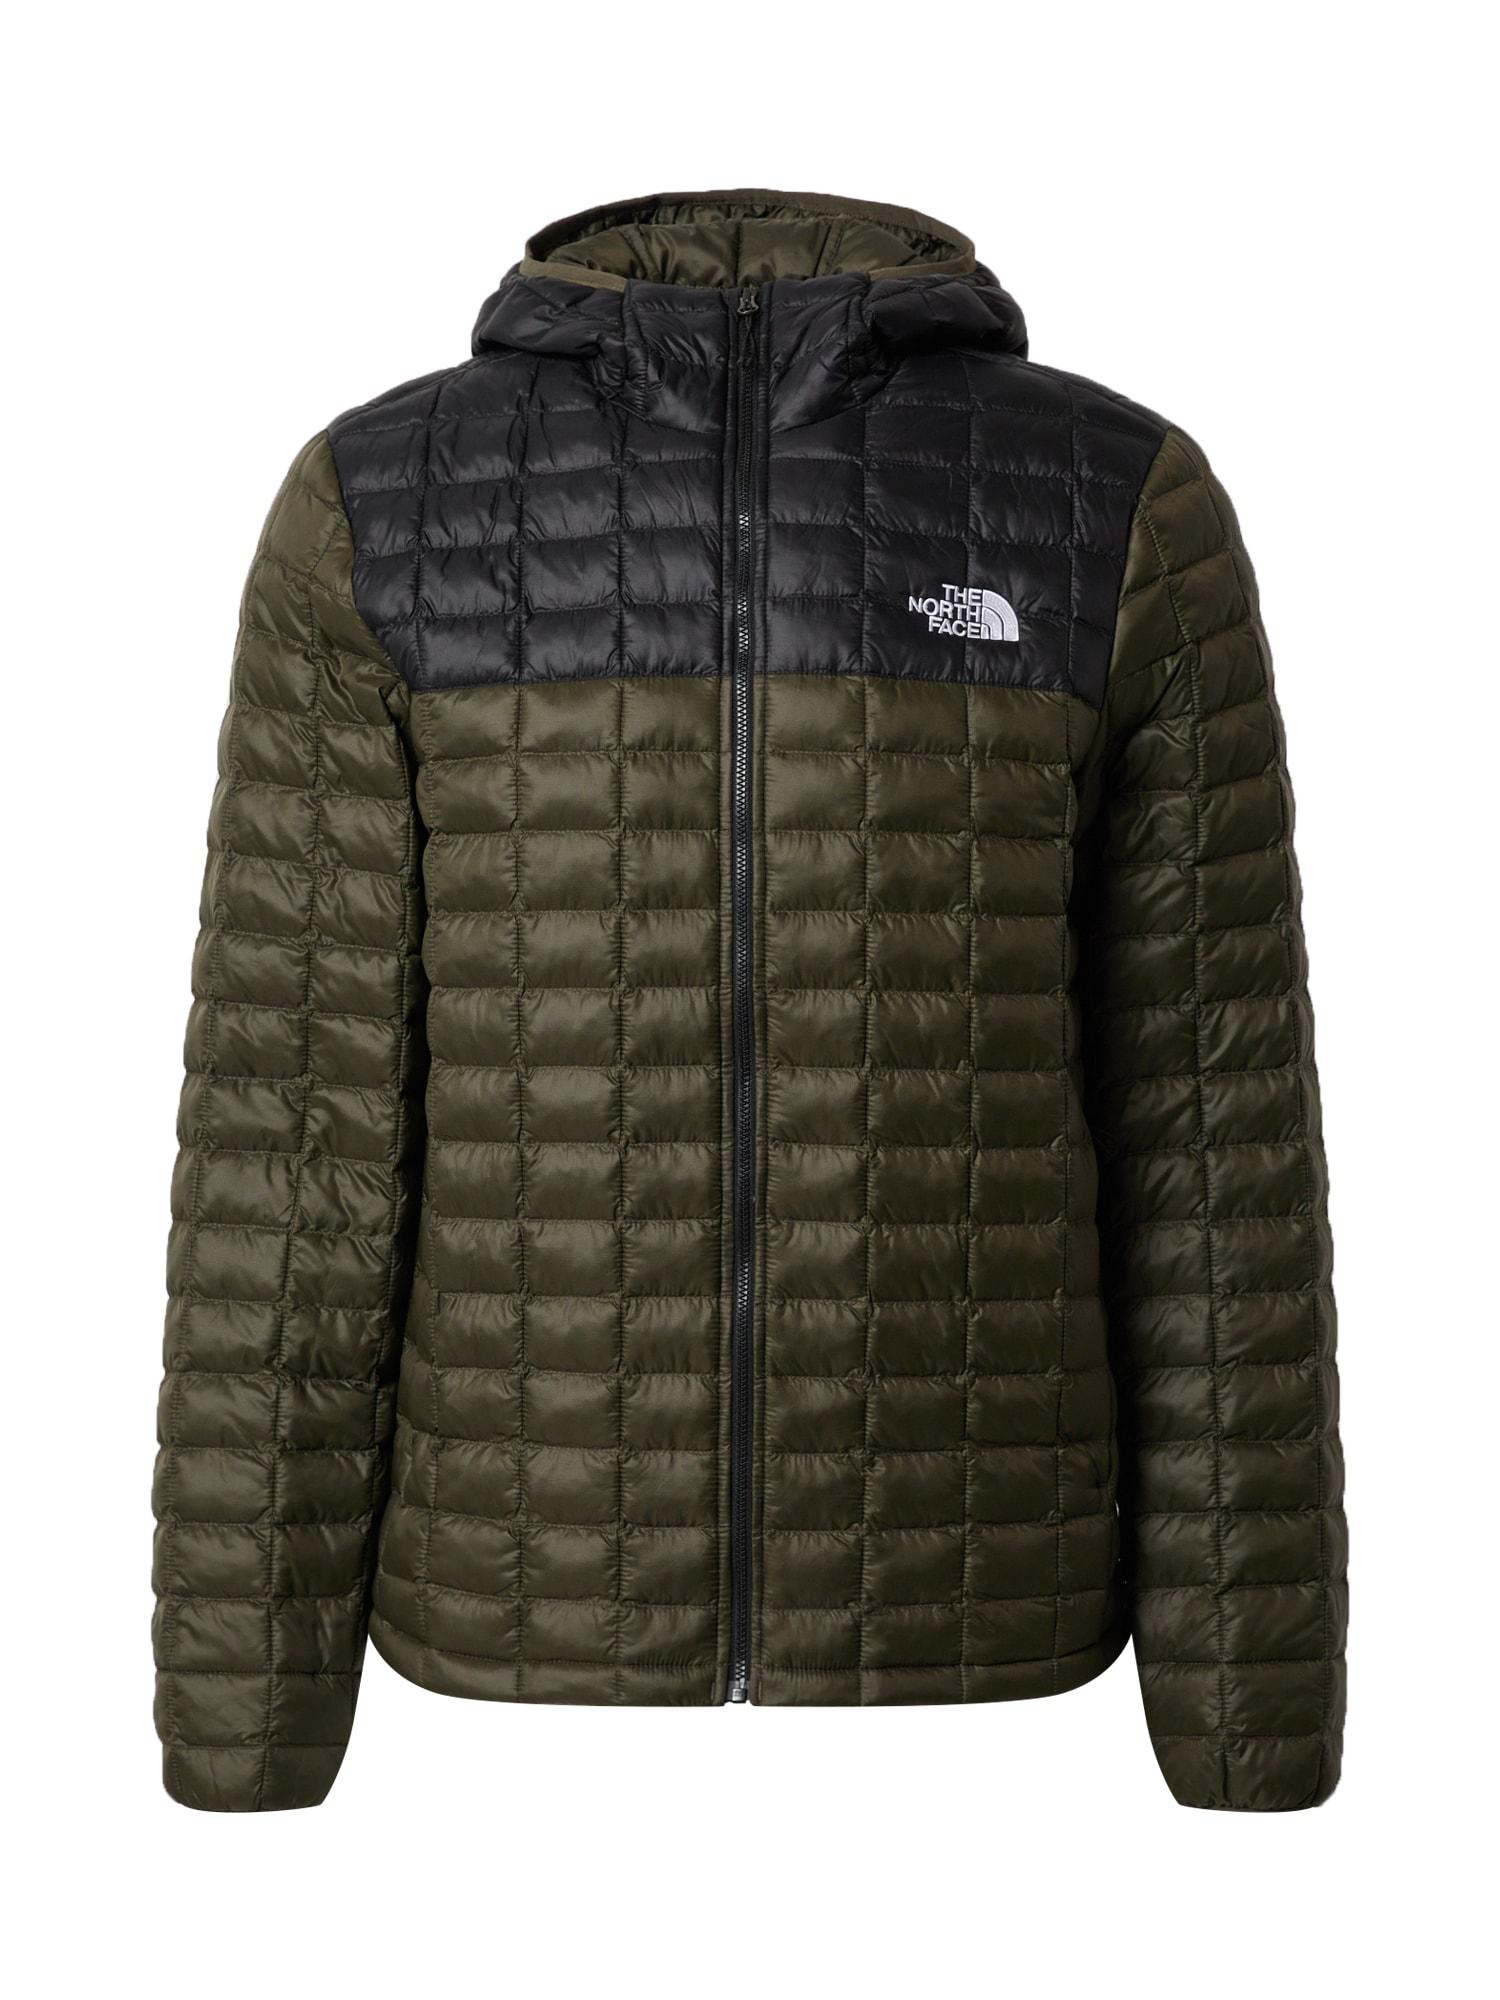 THE NORTH FACE Outdoorová bunda  khaki / černá